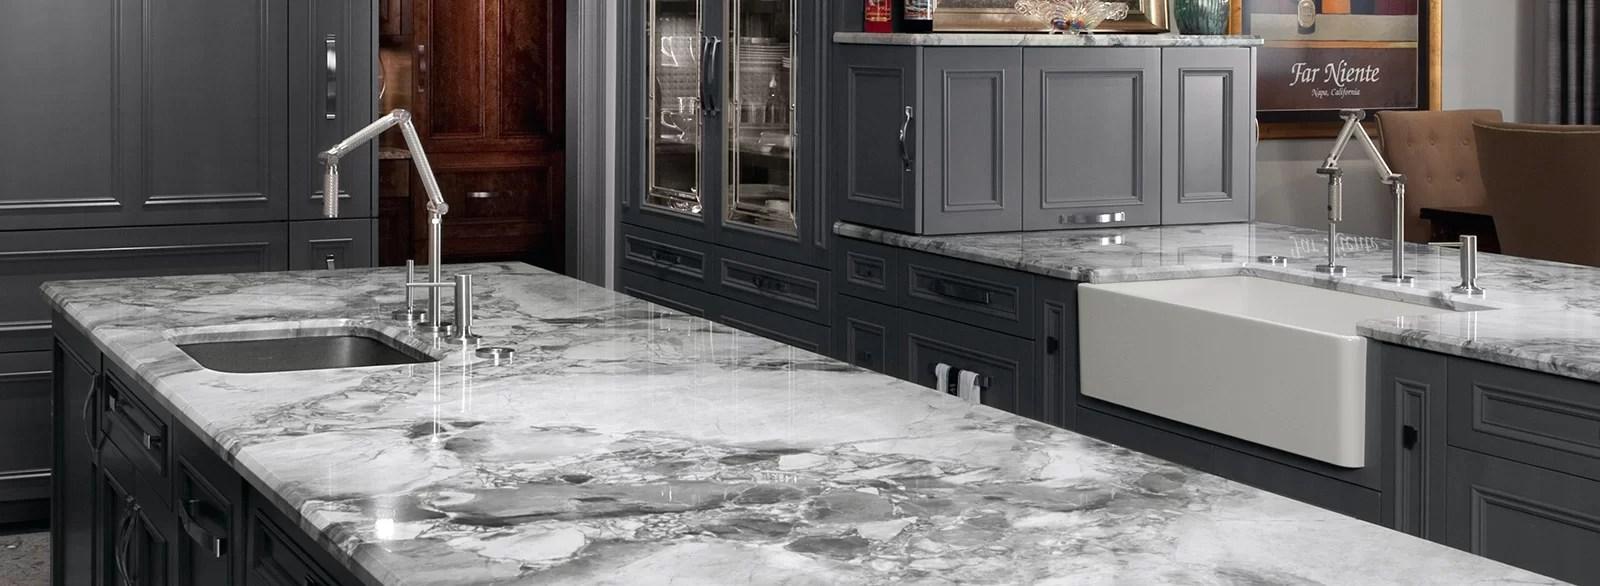 Kitchen Countertops Quartz Cost